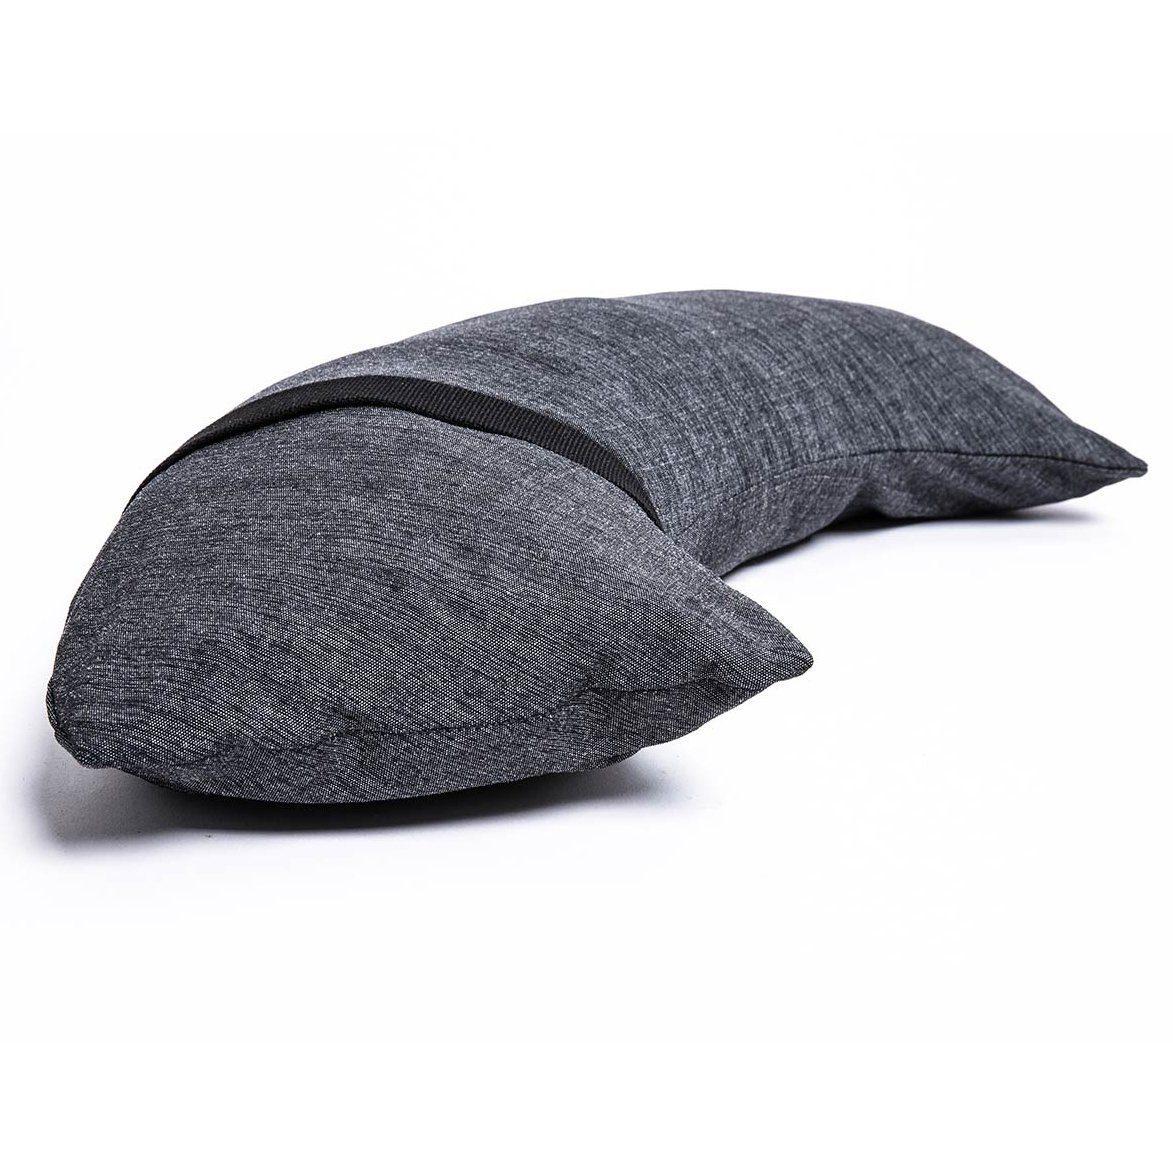 Sandpåse från Plinthit som väger 25 kg i antracit.